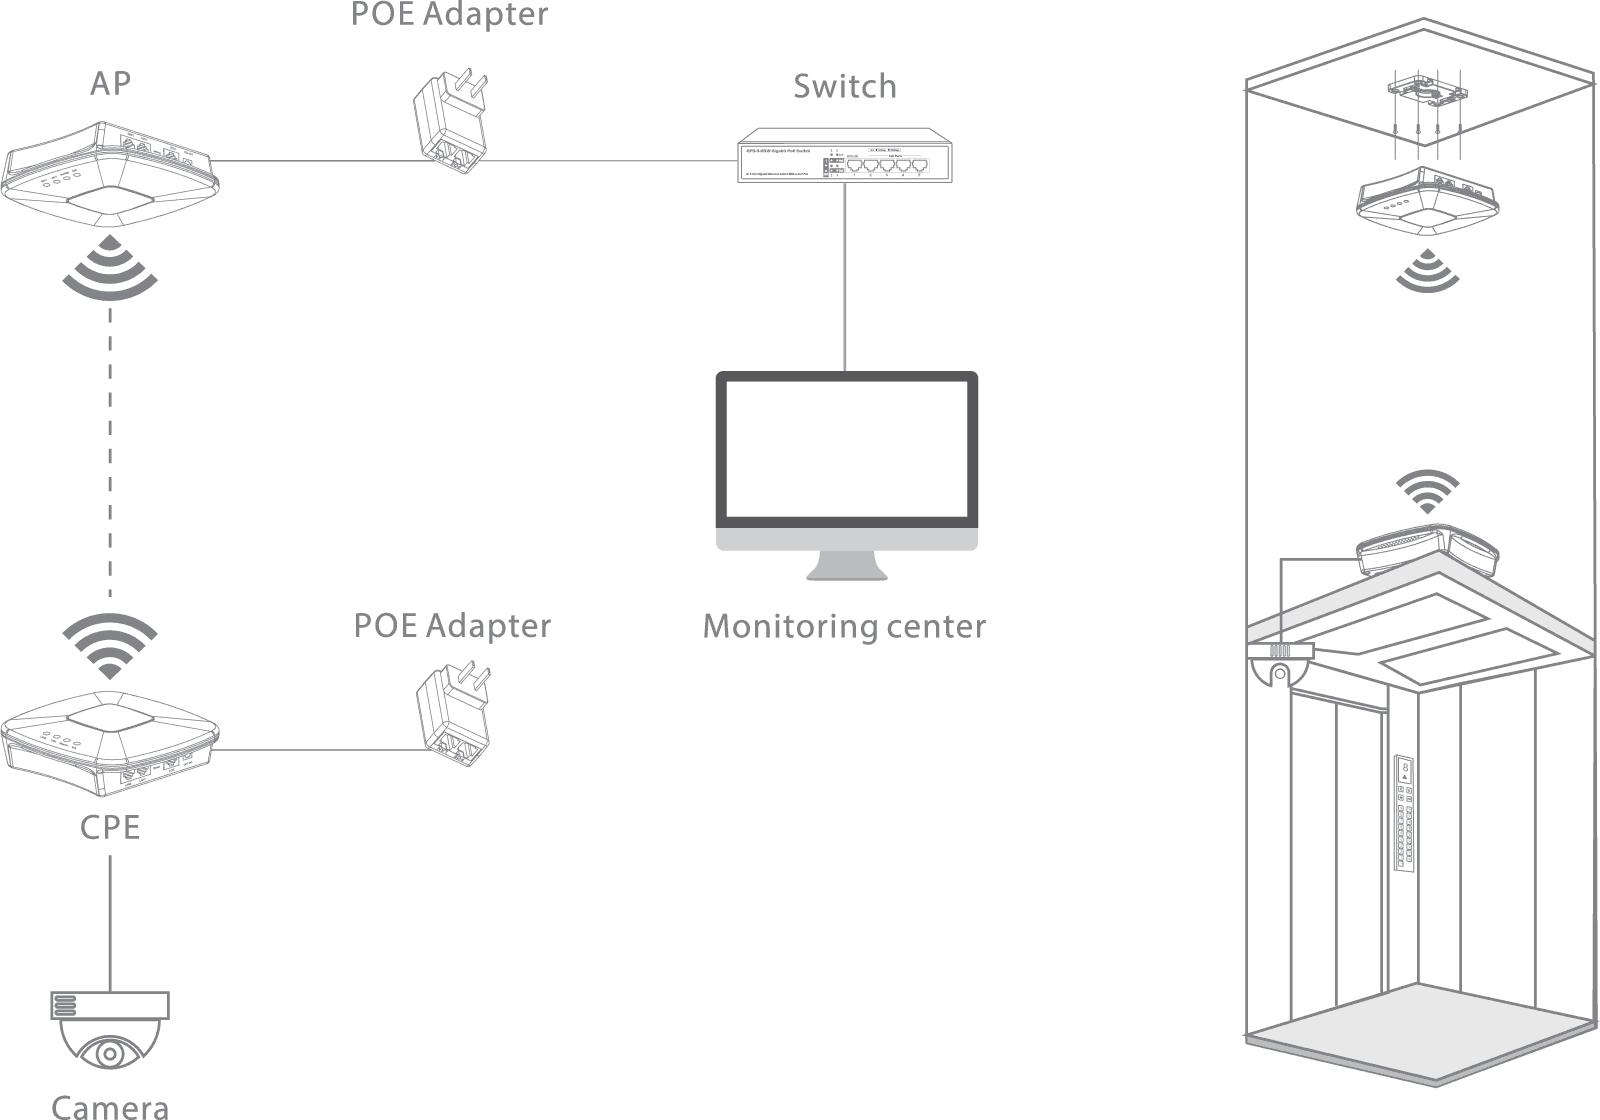 Elevator Wireless Bridge Kit for Surveillance Video